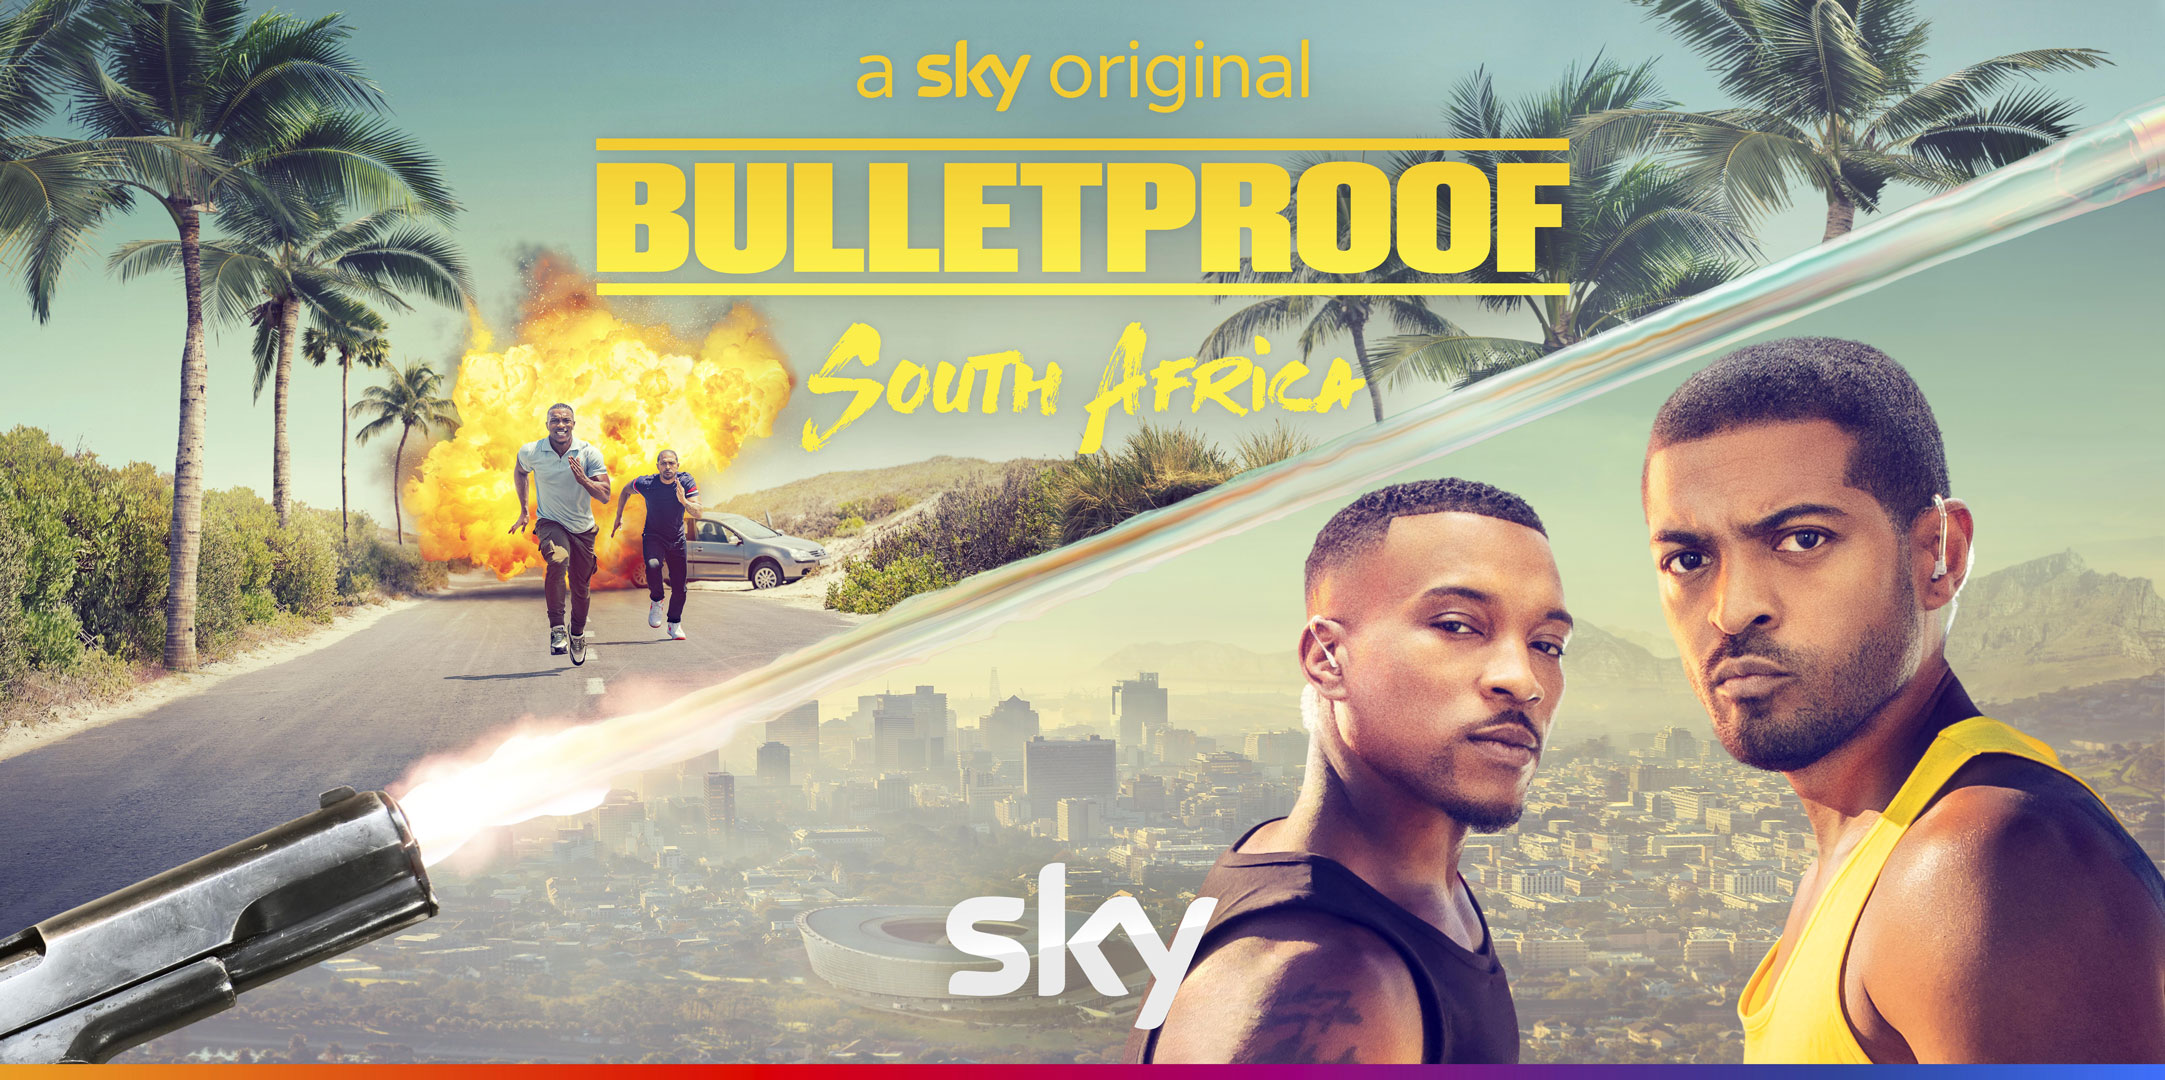 KA_04_BulletproofSouthAfrica_S03